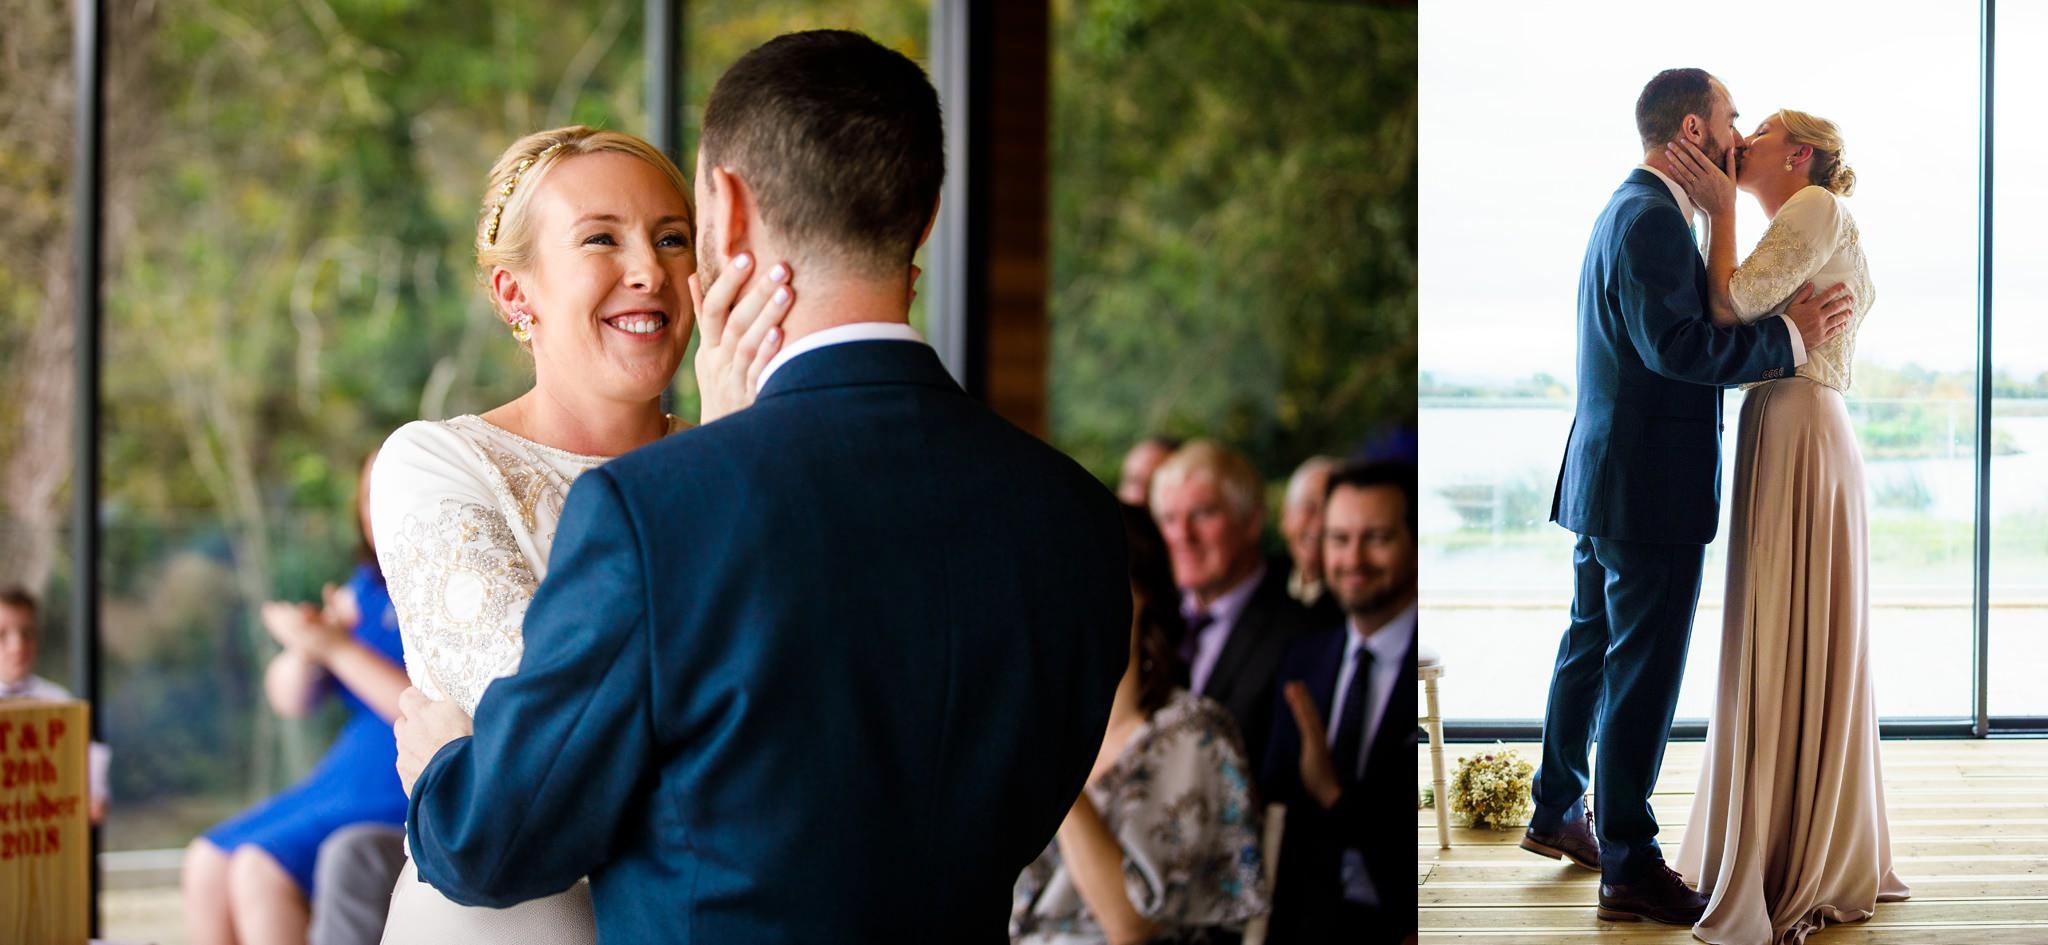 Elisha-Clarke-Photography-Dublin-City-Wedding_0075.jpg